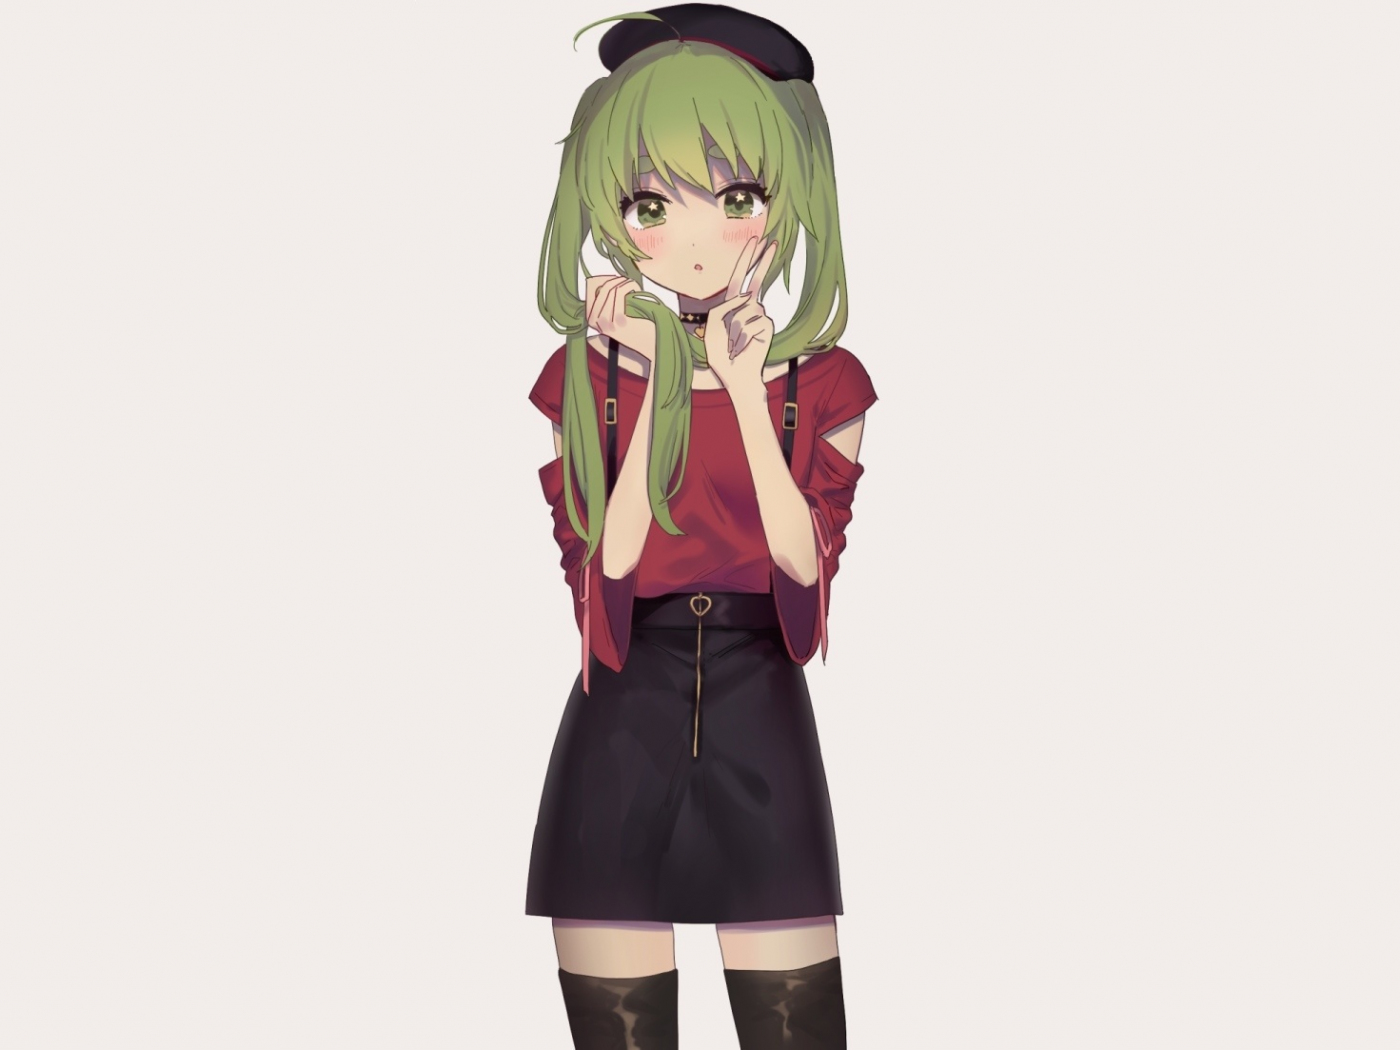 Download 12x12 wallpaper green hair, cute, anime girl